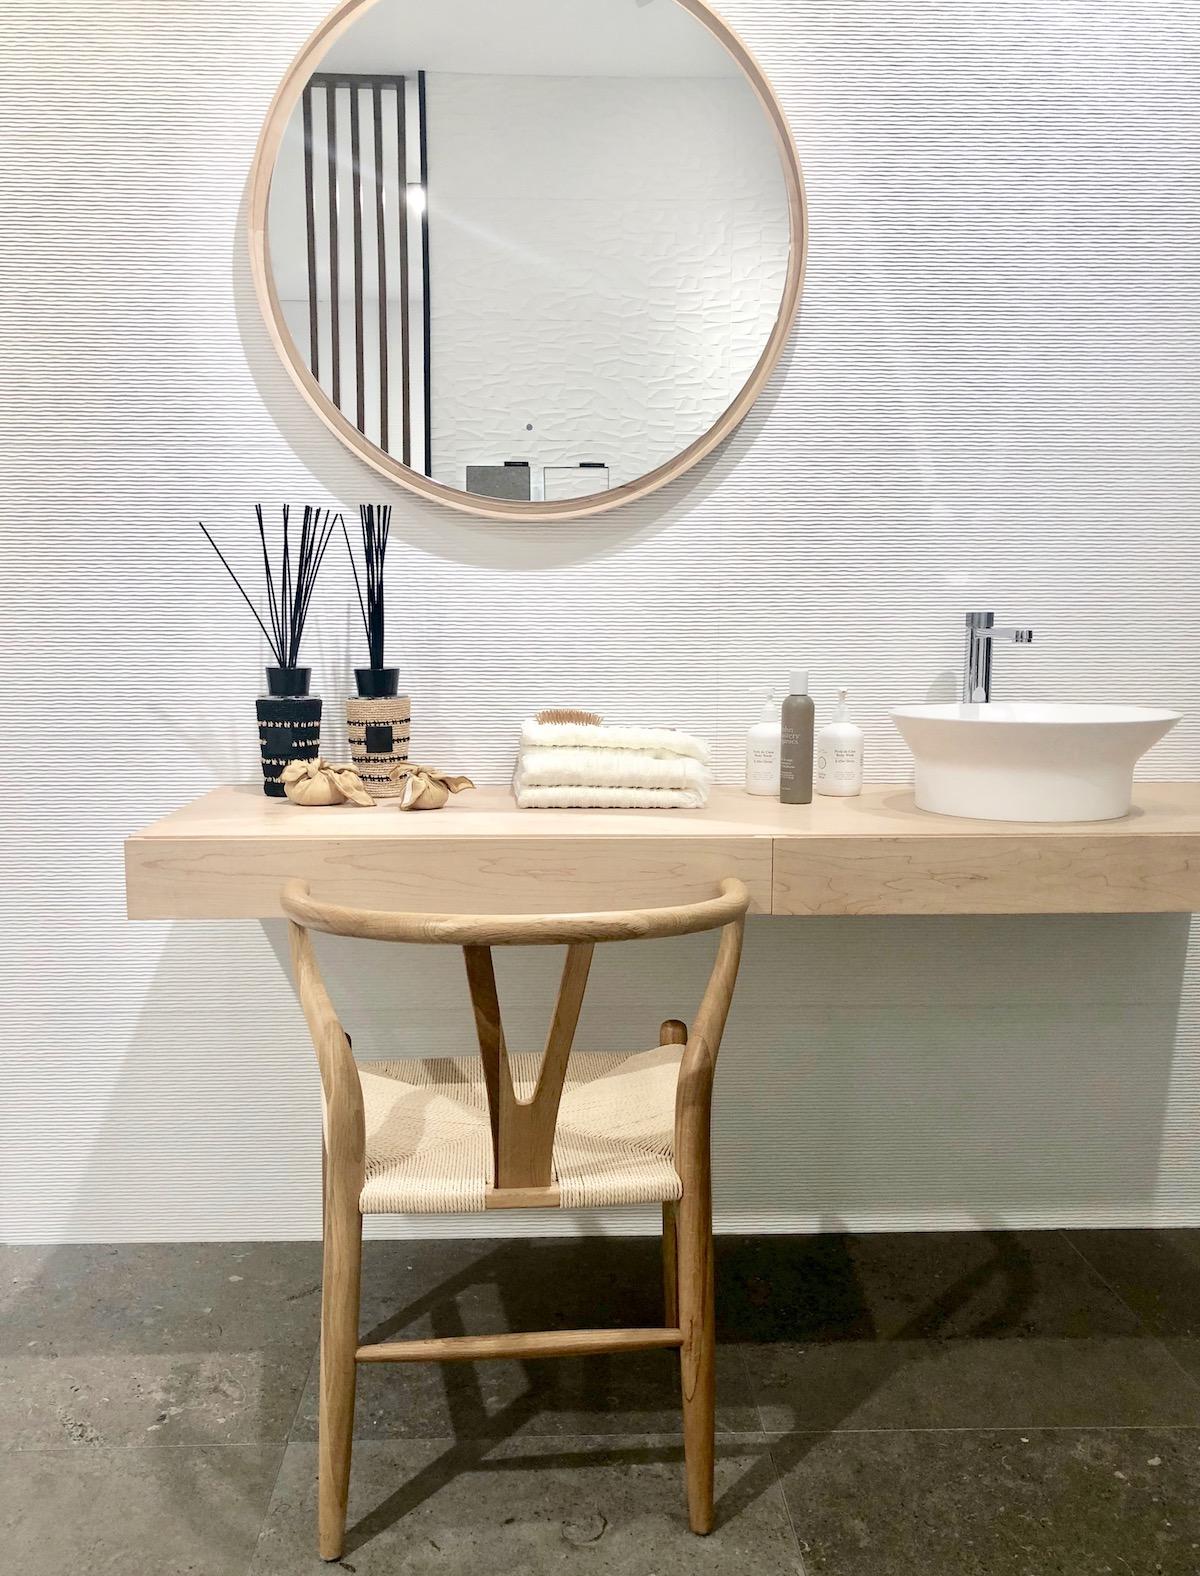 salle de bain coiffeuse hygge slow living scandinave minimaliste - clemaroundthecorner